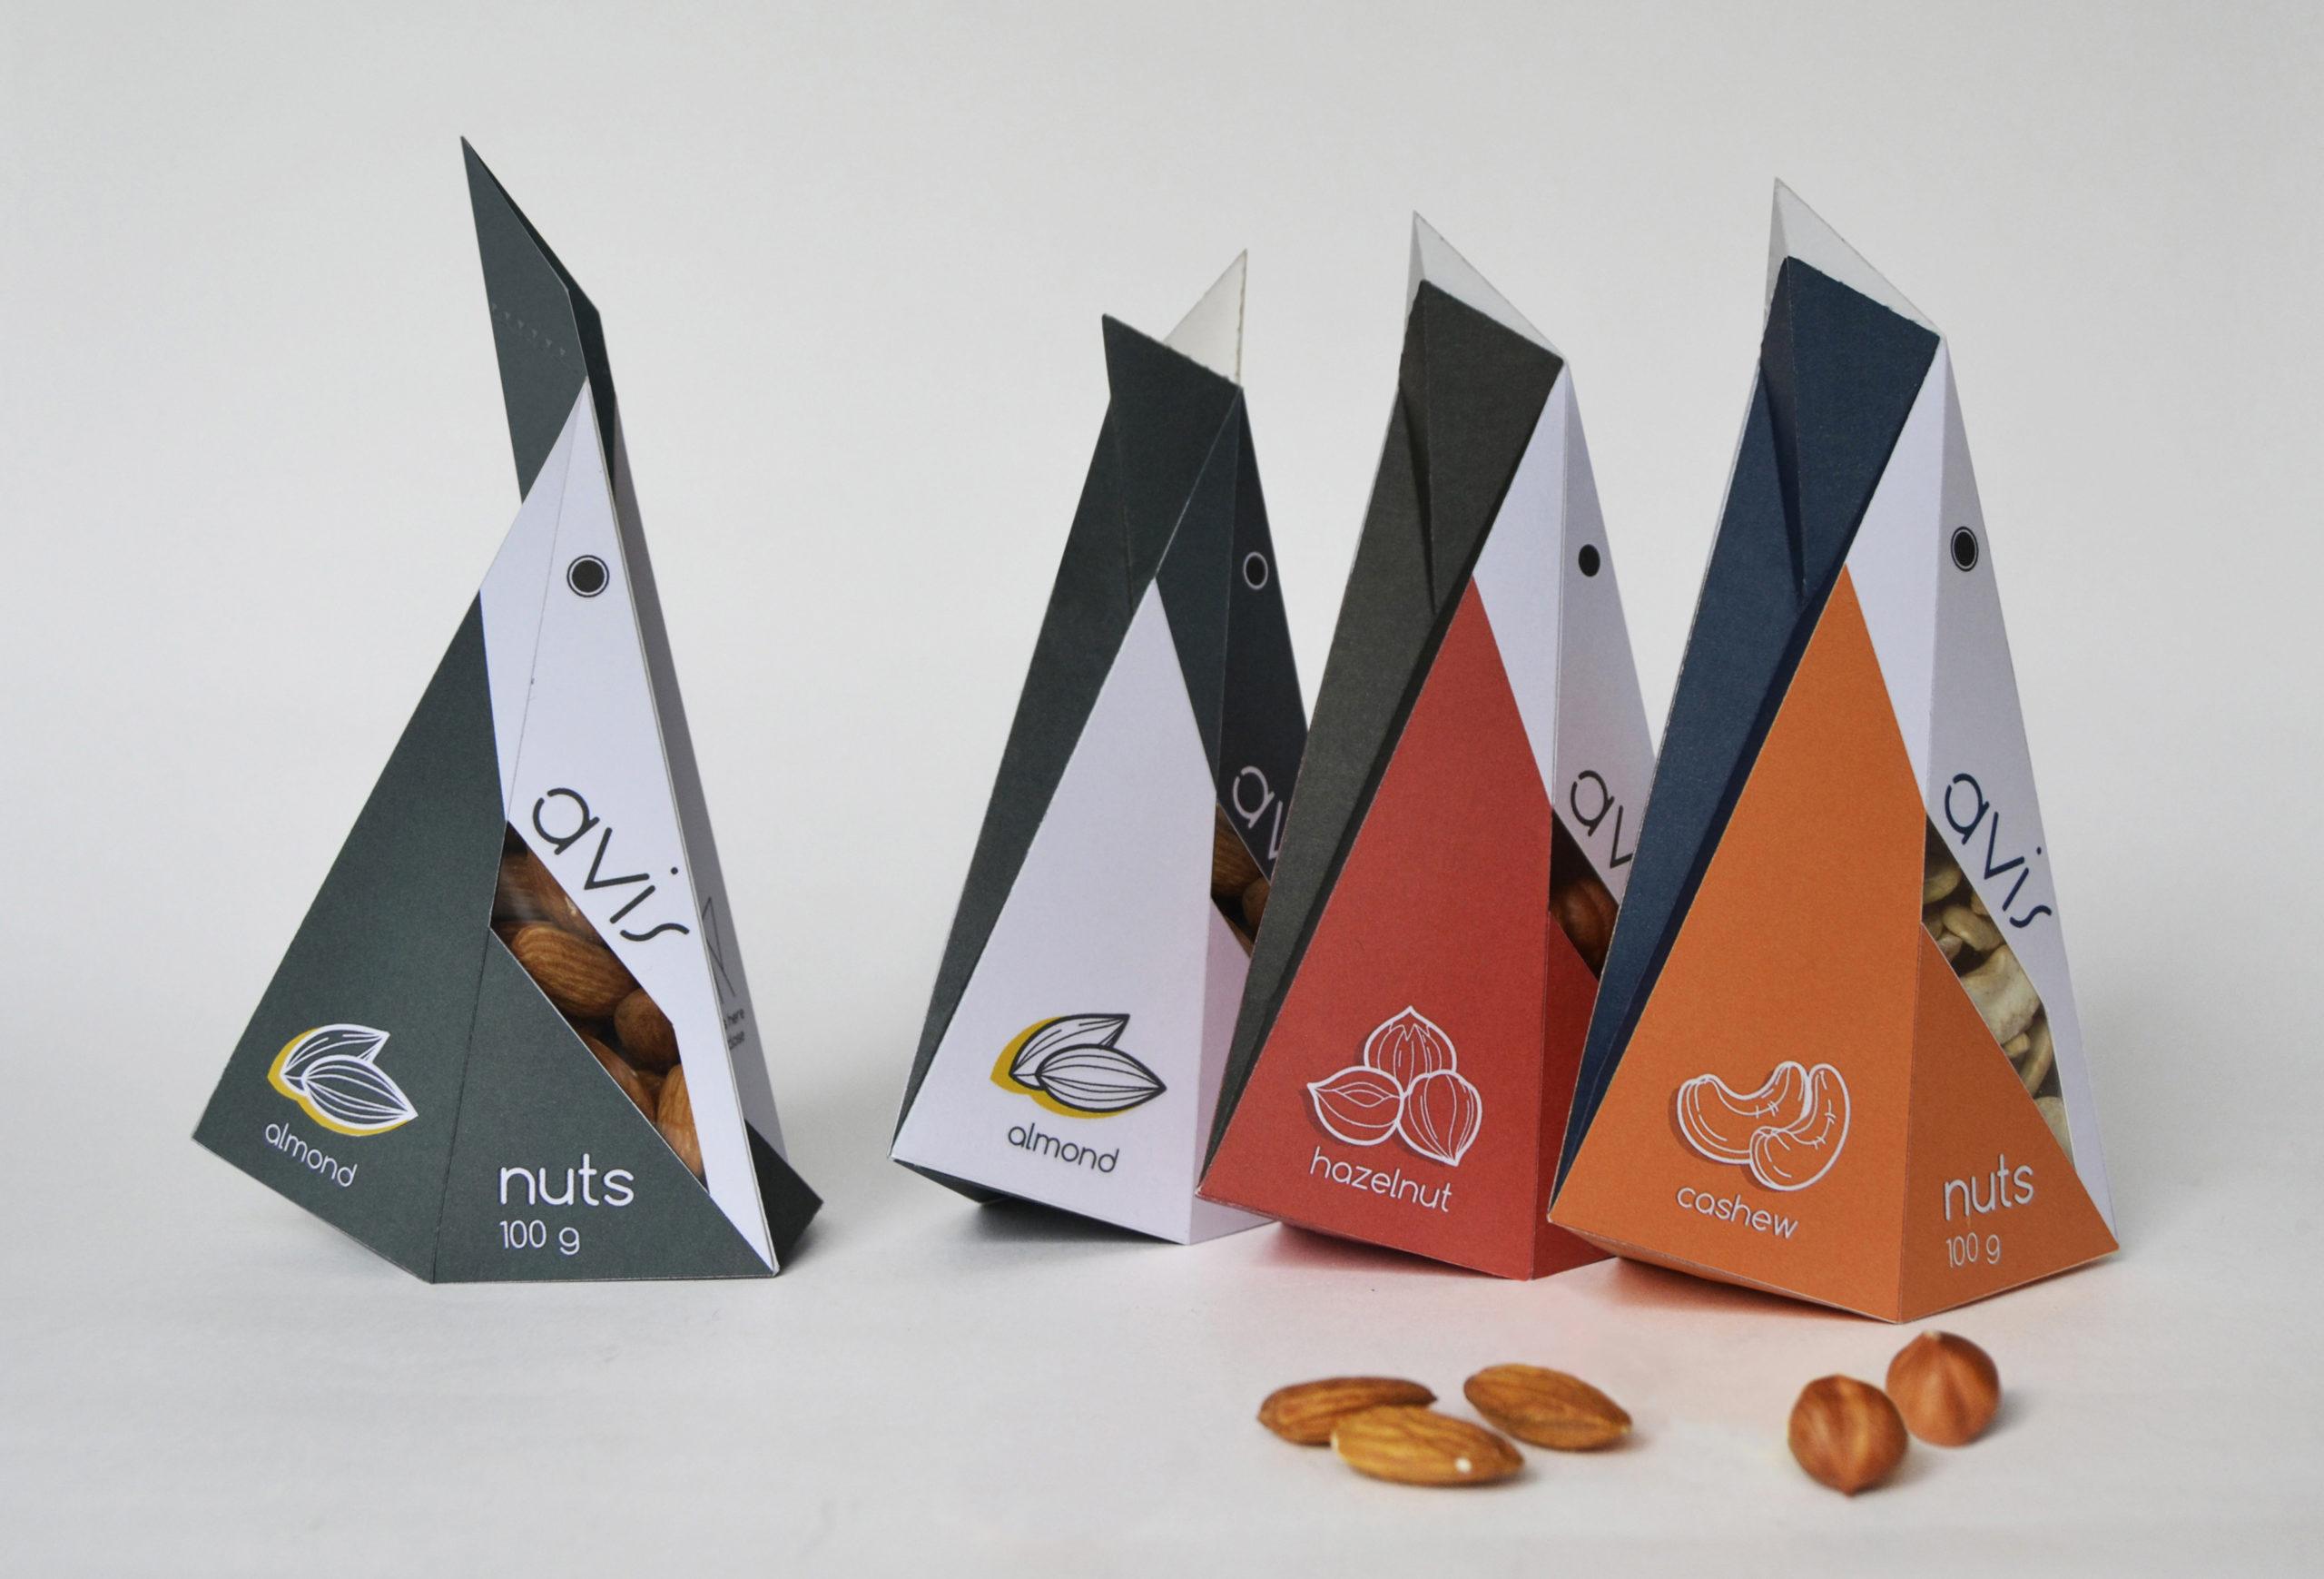 carton-award-image 236236